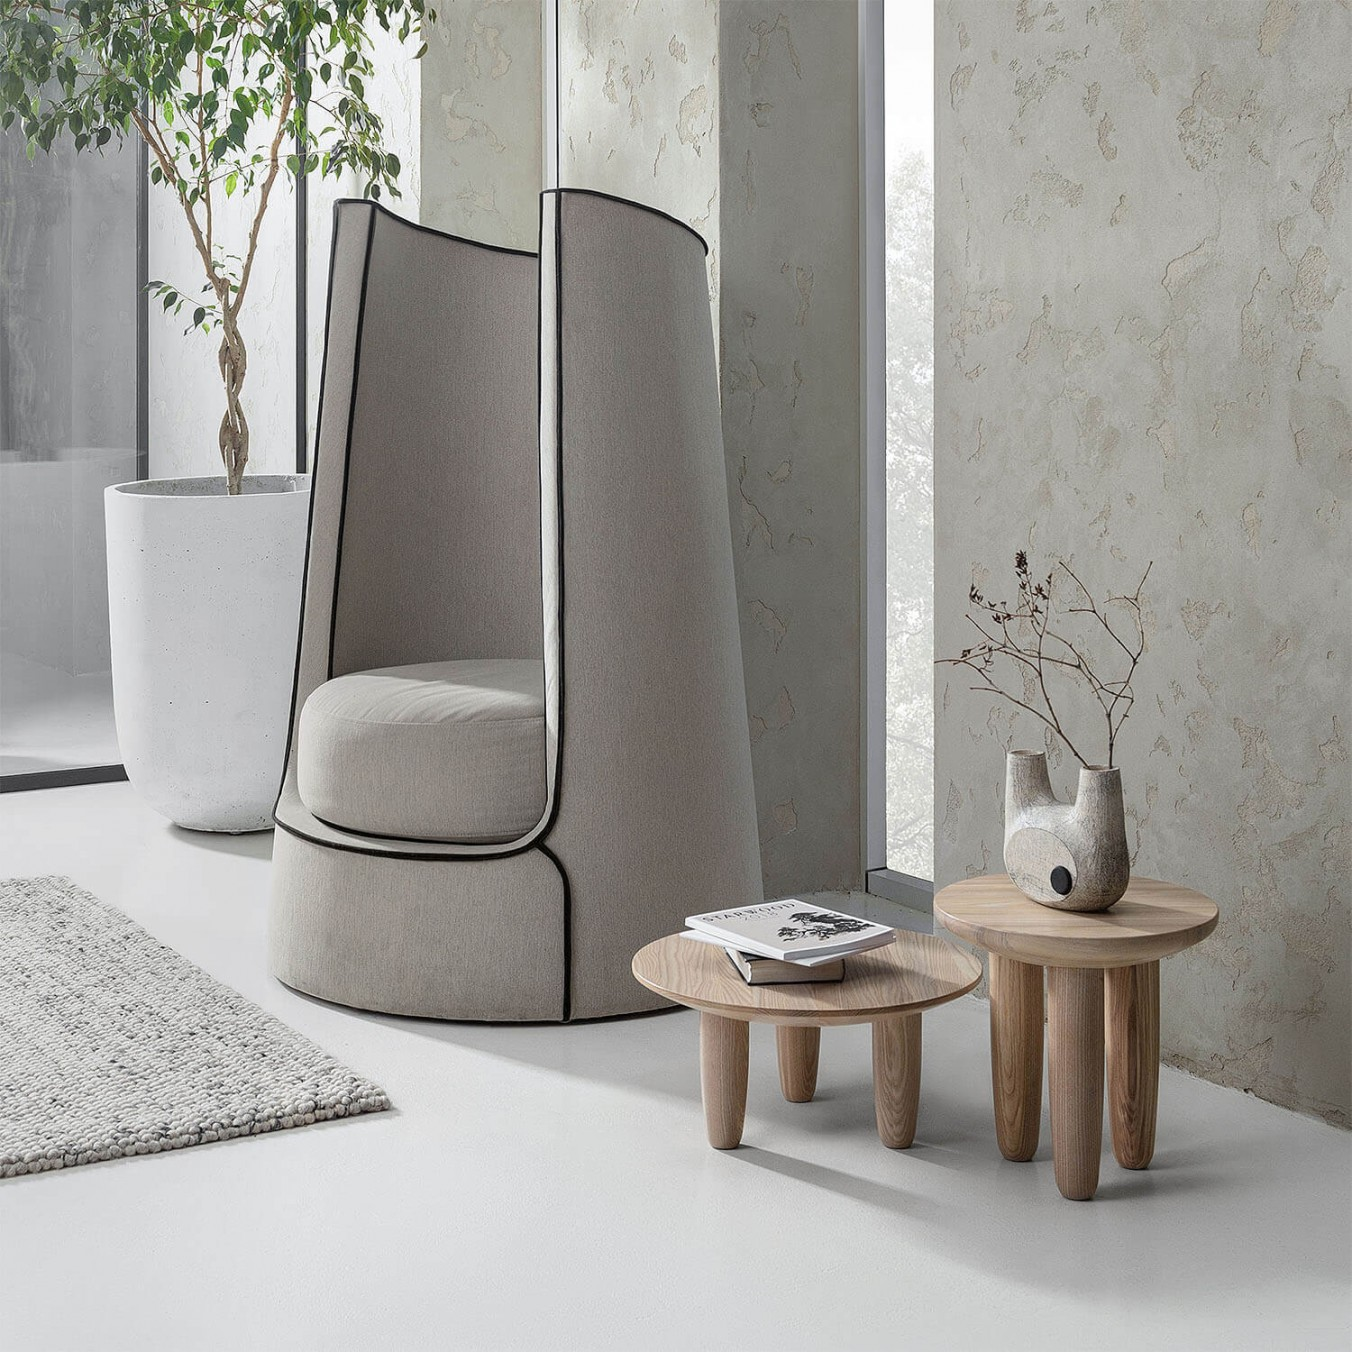 LONO armchair